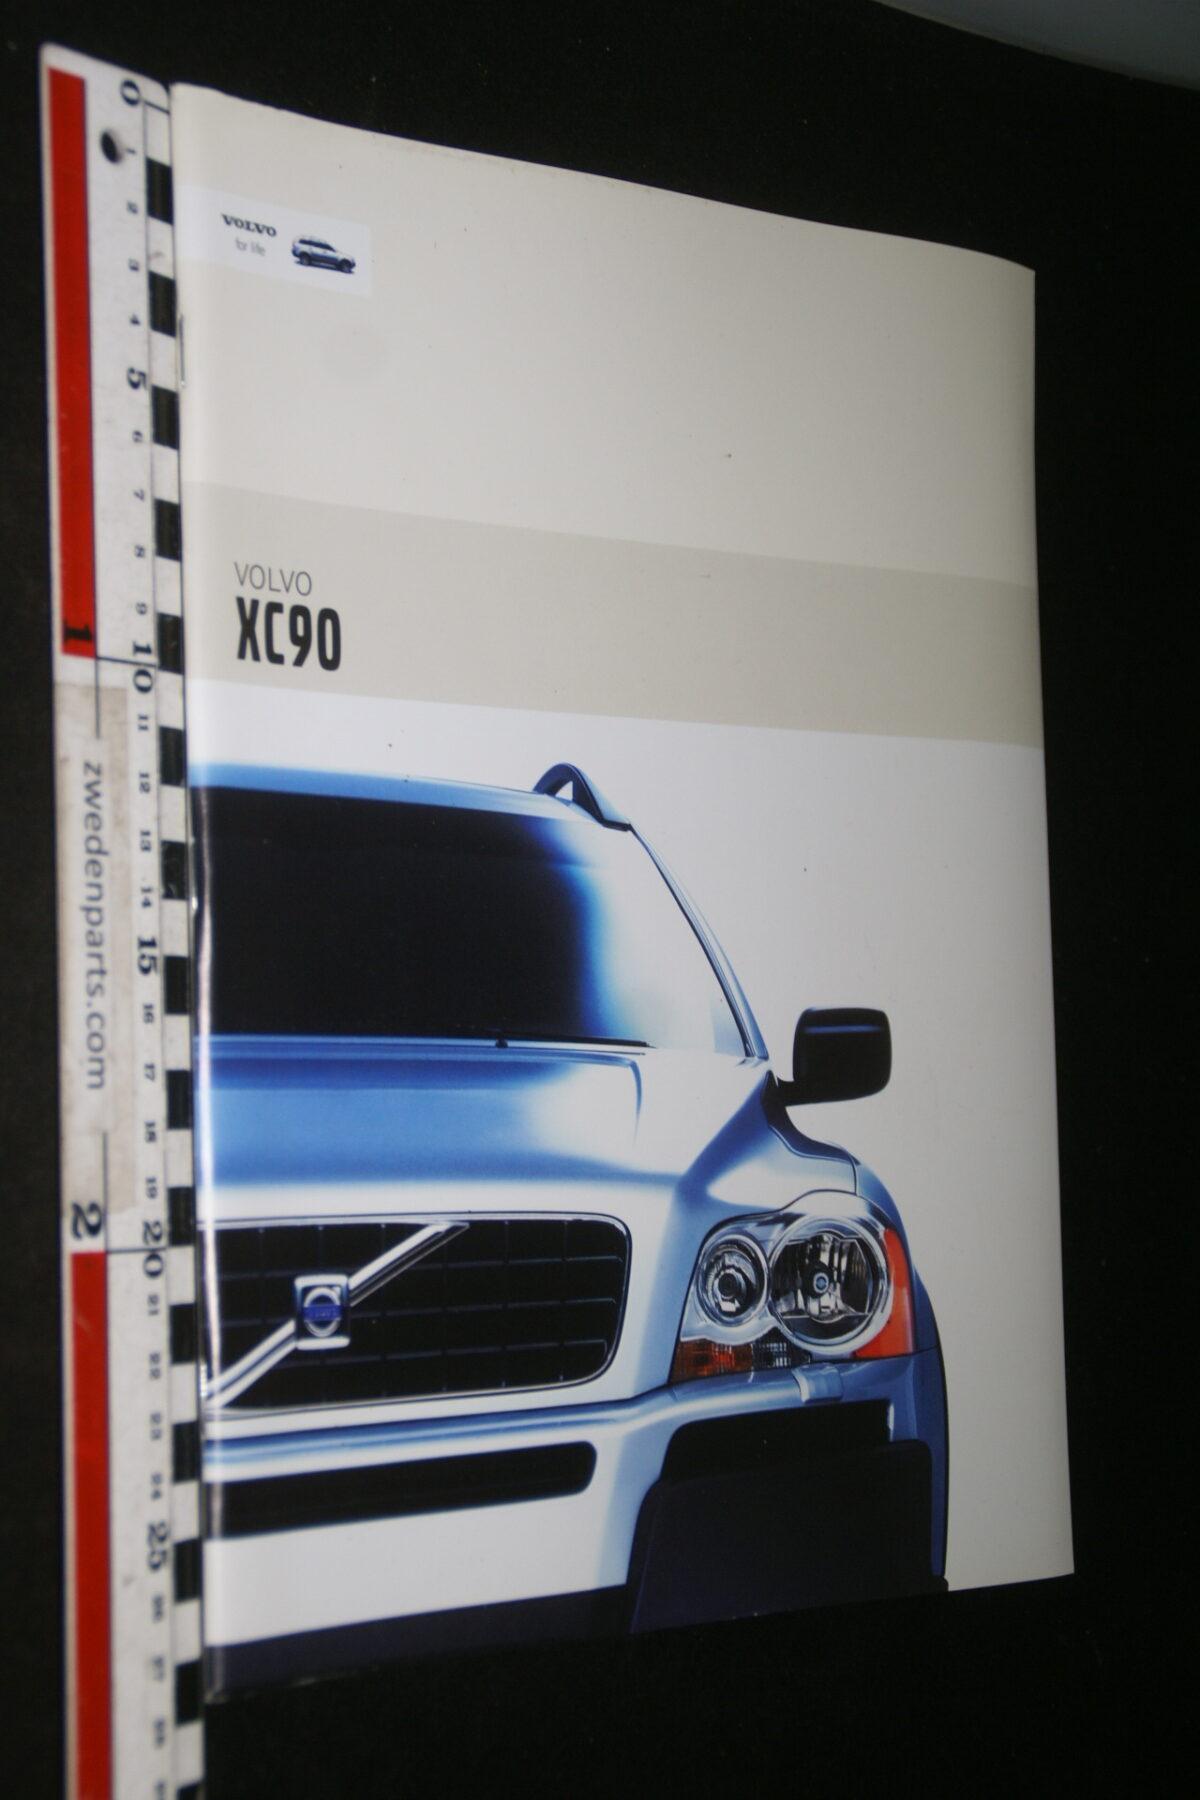 DSC04431 2003 brochure Volvo XC90 nr. MSPV MY 03V1 0502-5e5321c8